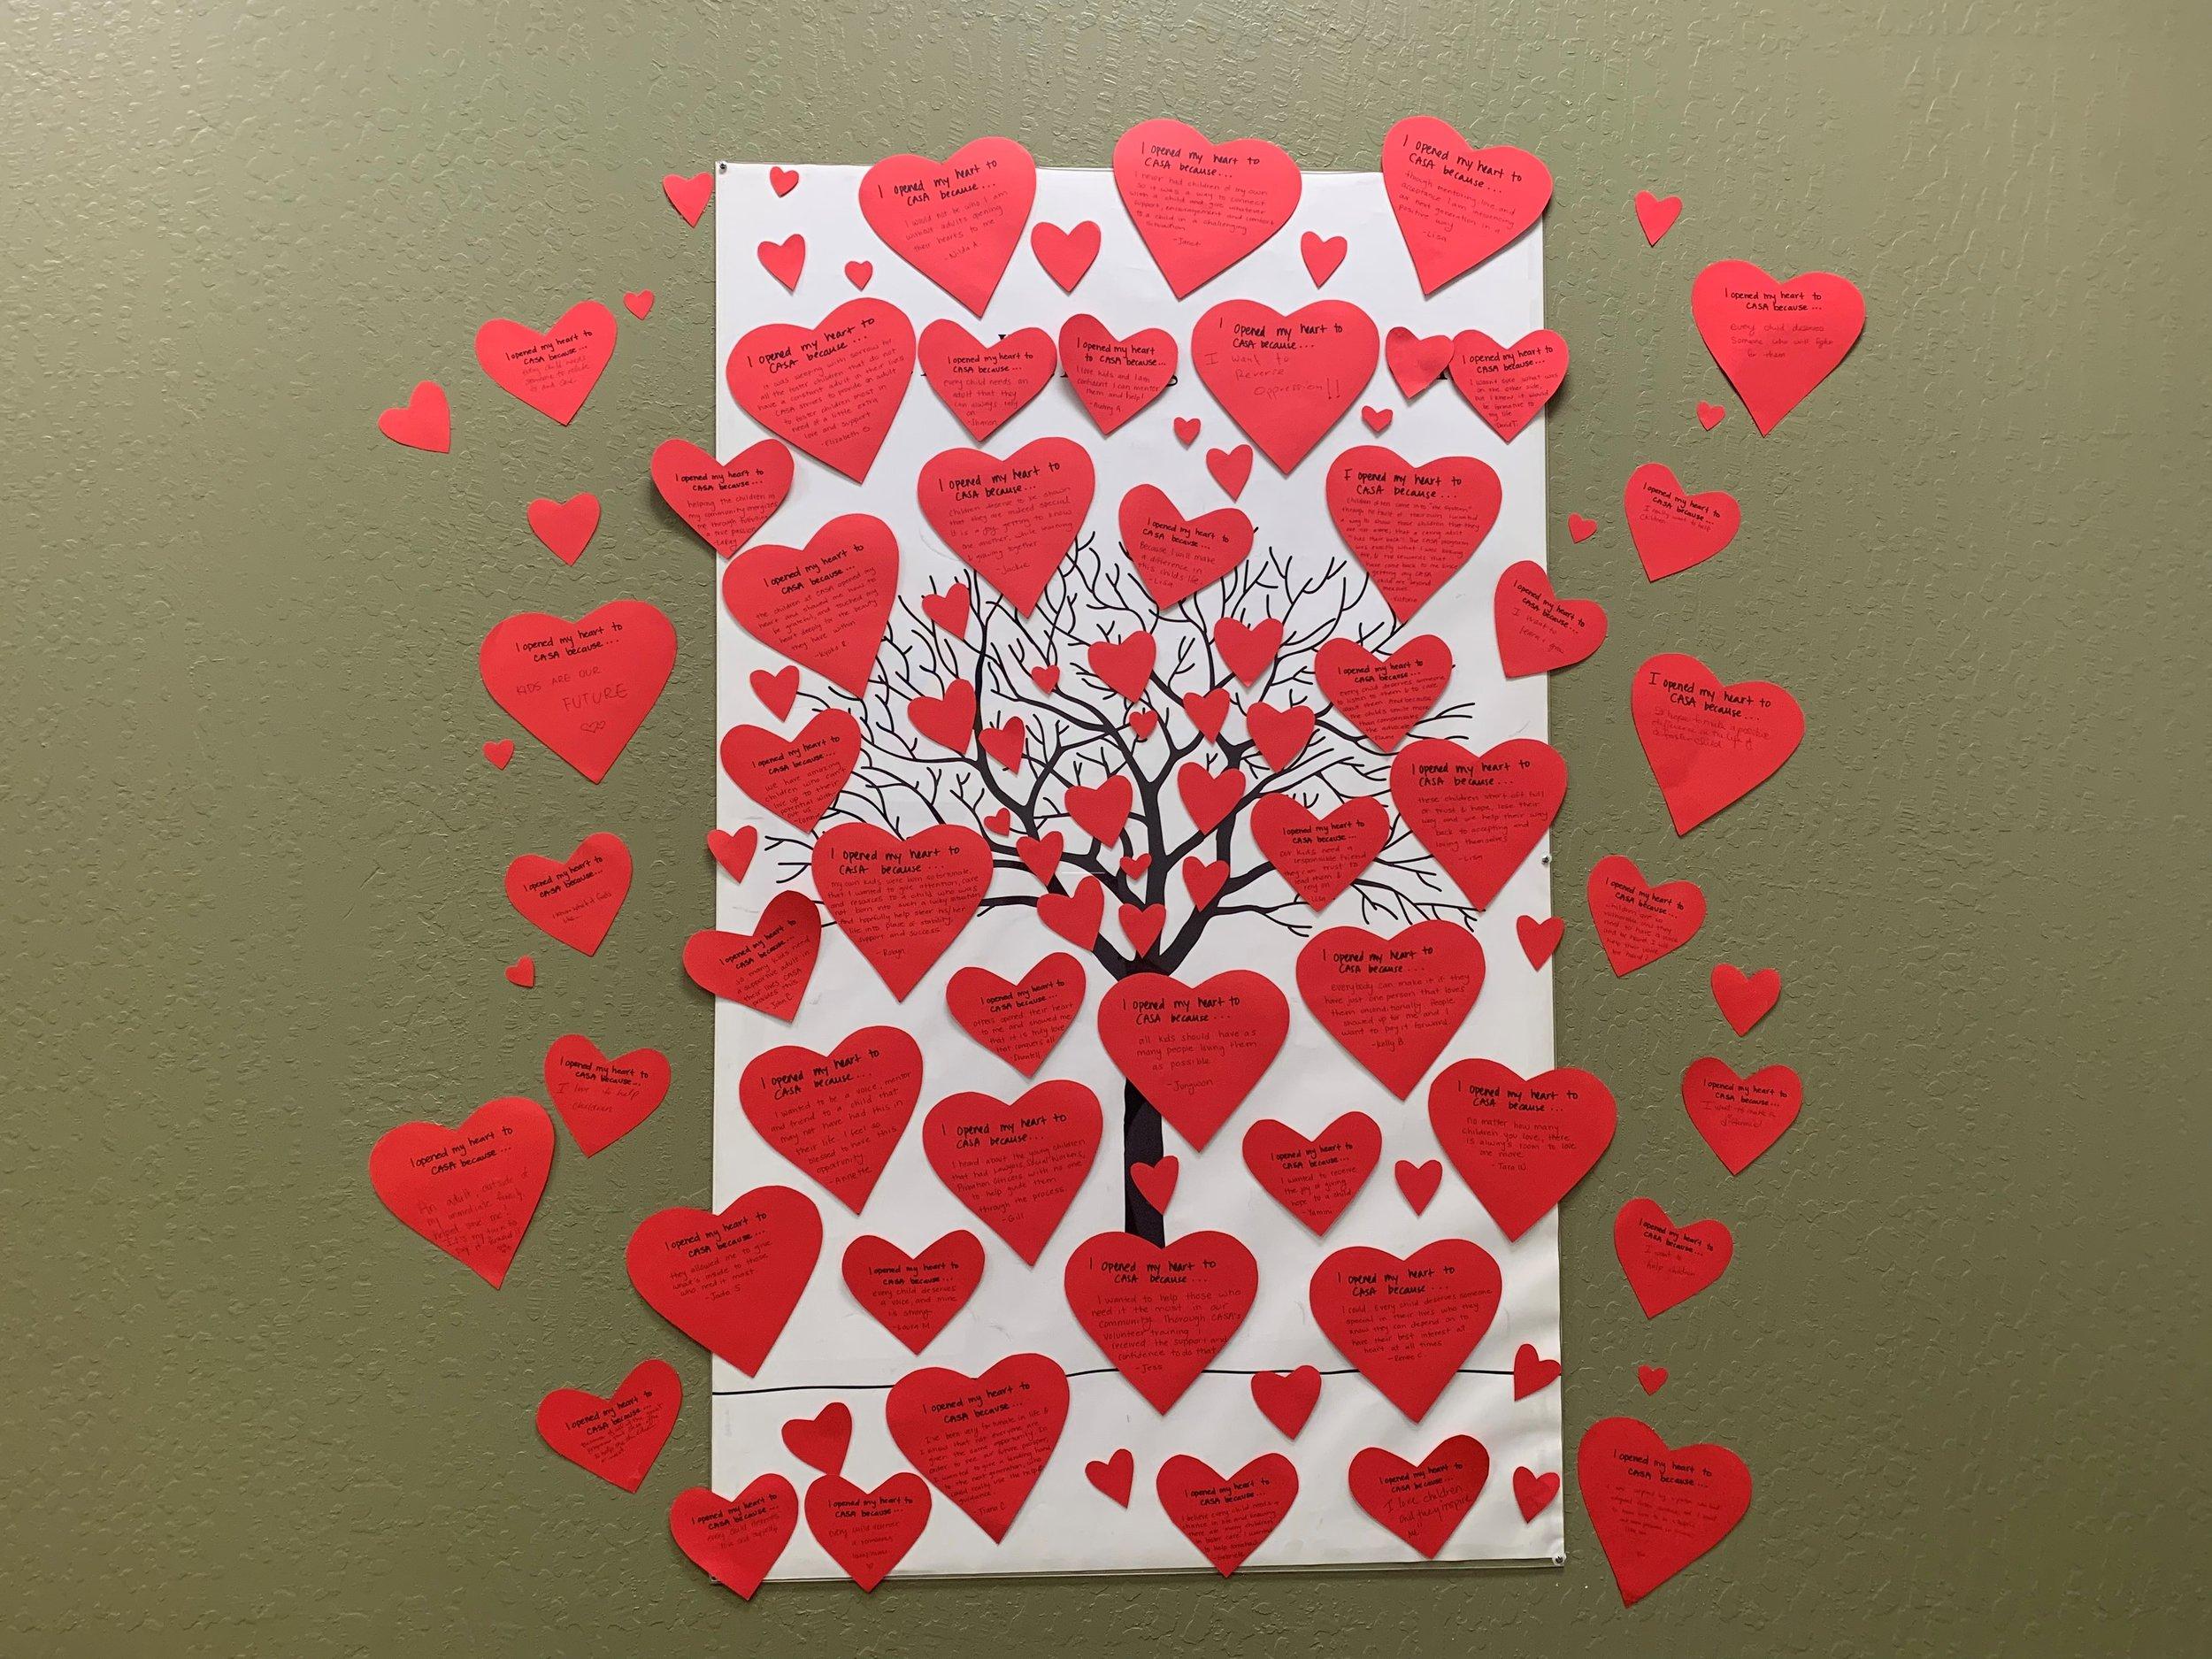 heart wall.jpg